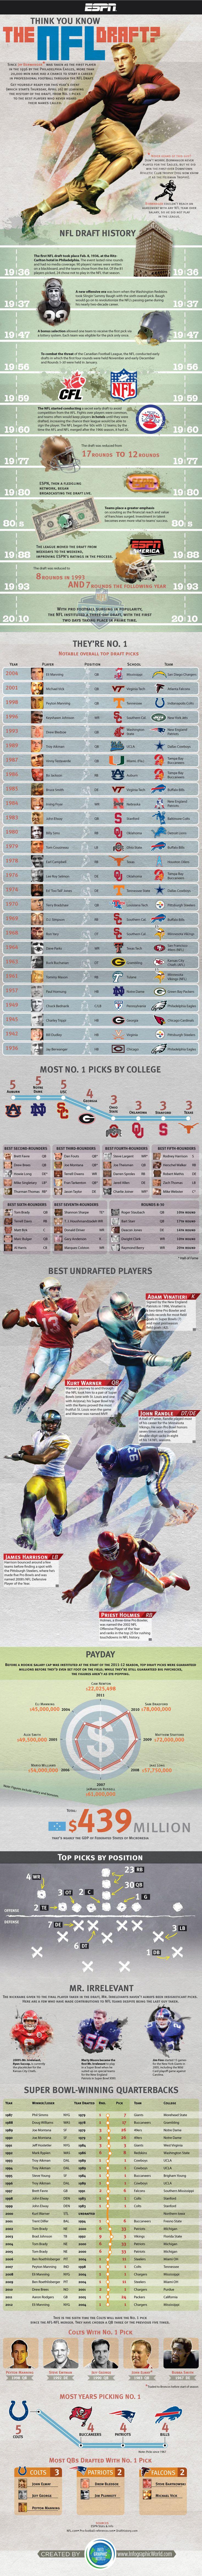 best 25 sports trivia questions ideas on pinterest 49ers stats